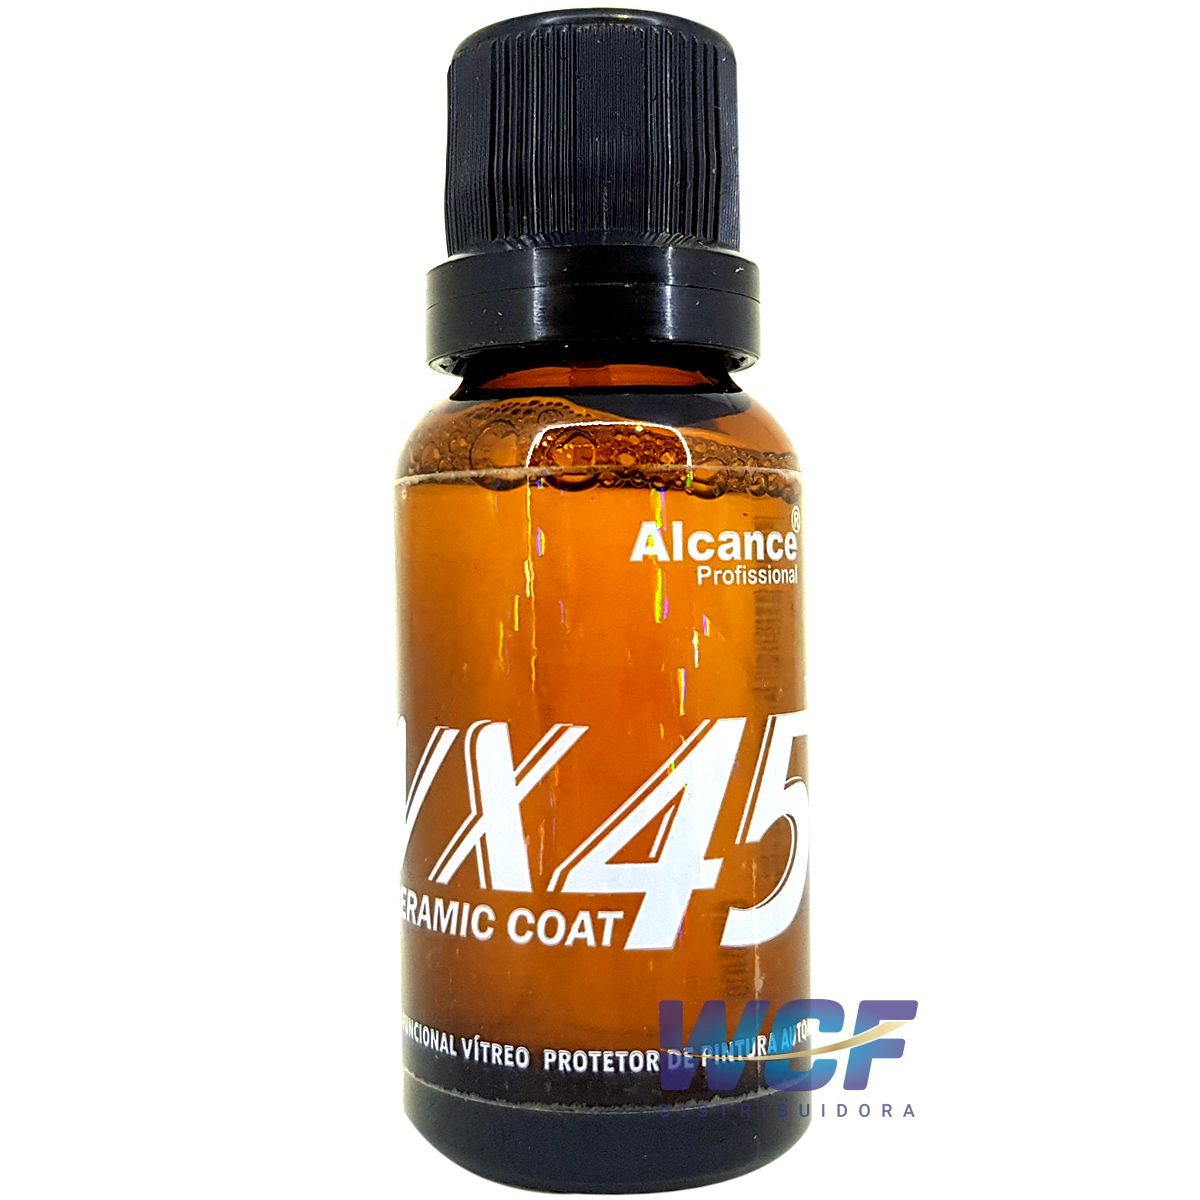 ALCANCE VX-45 VITRIFICADOR 20ML